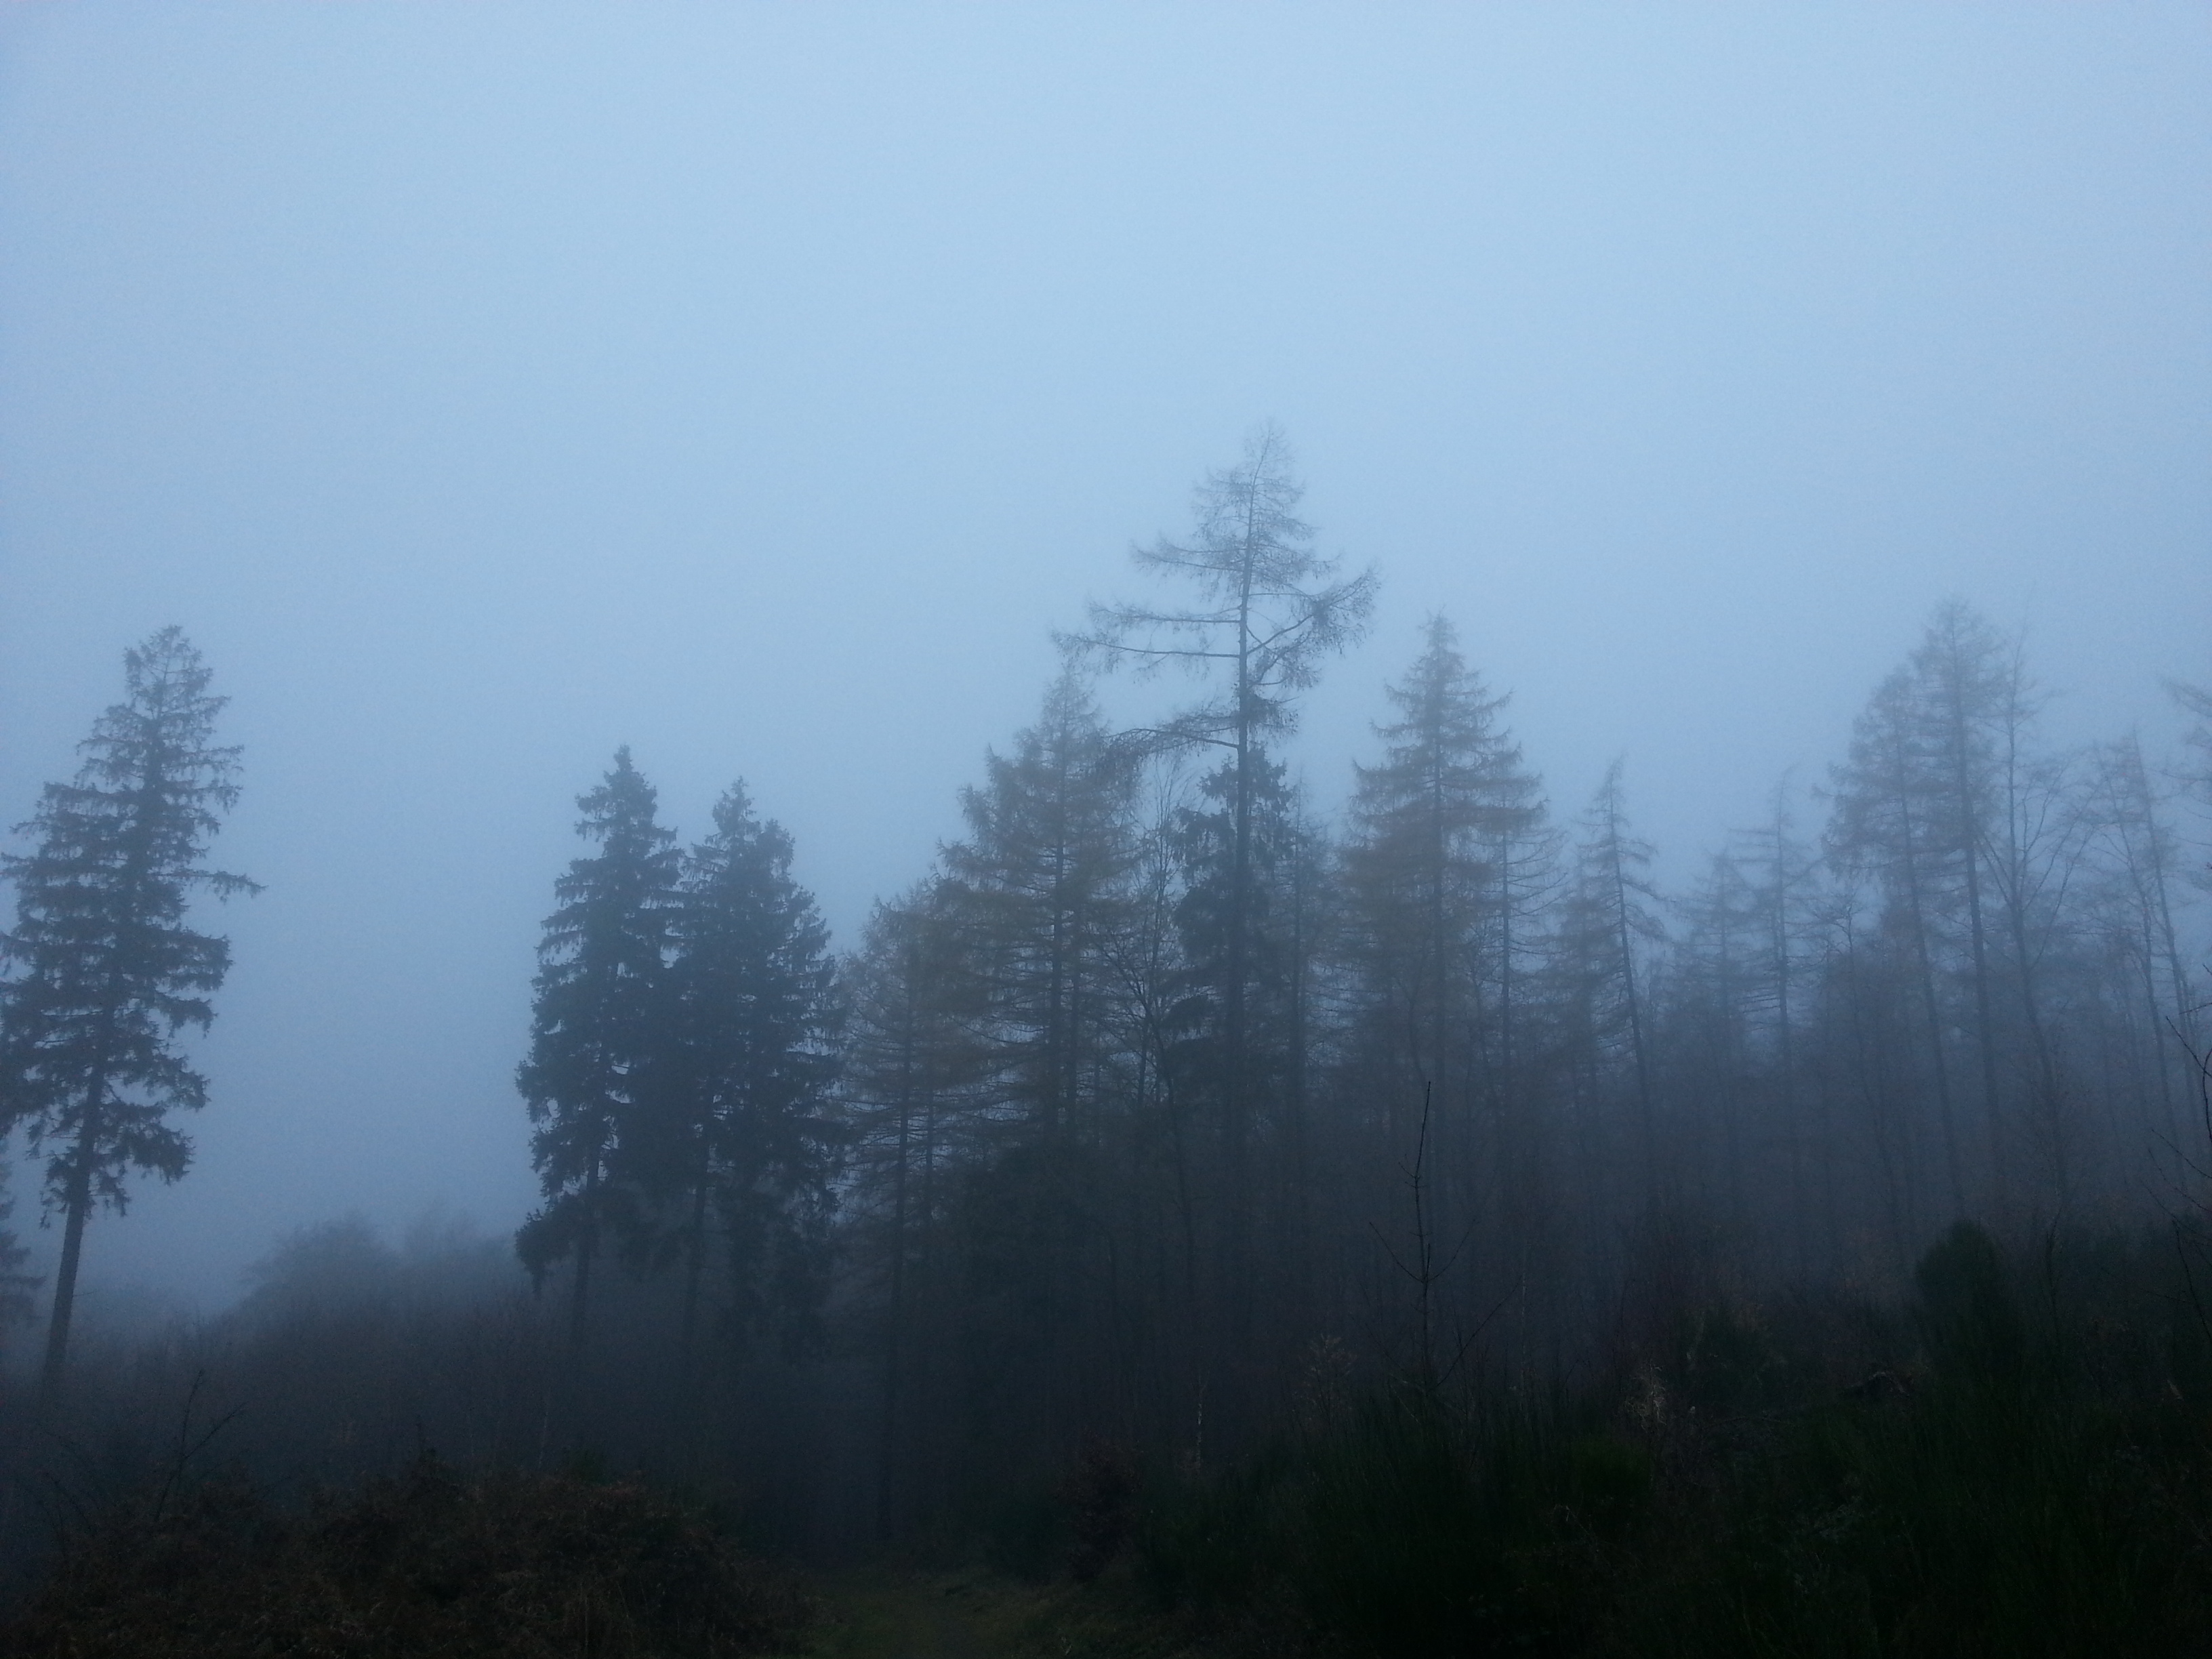 https://upload.wikimedia.org/wikipedia/commons/8/81/Depressing_path_in_the_twilight.jpg